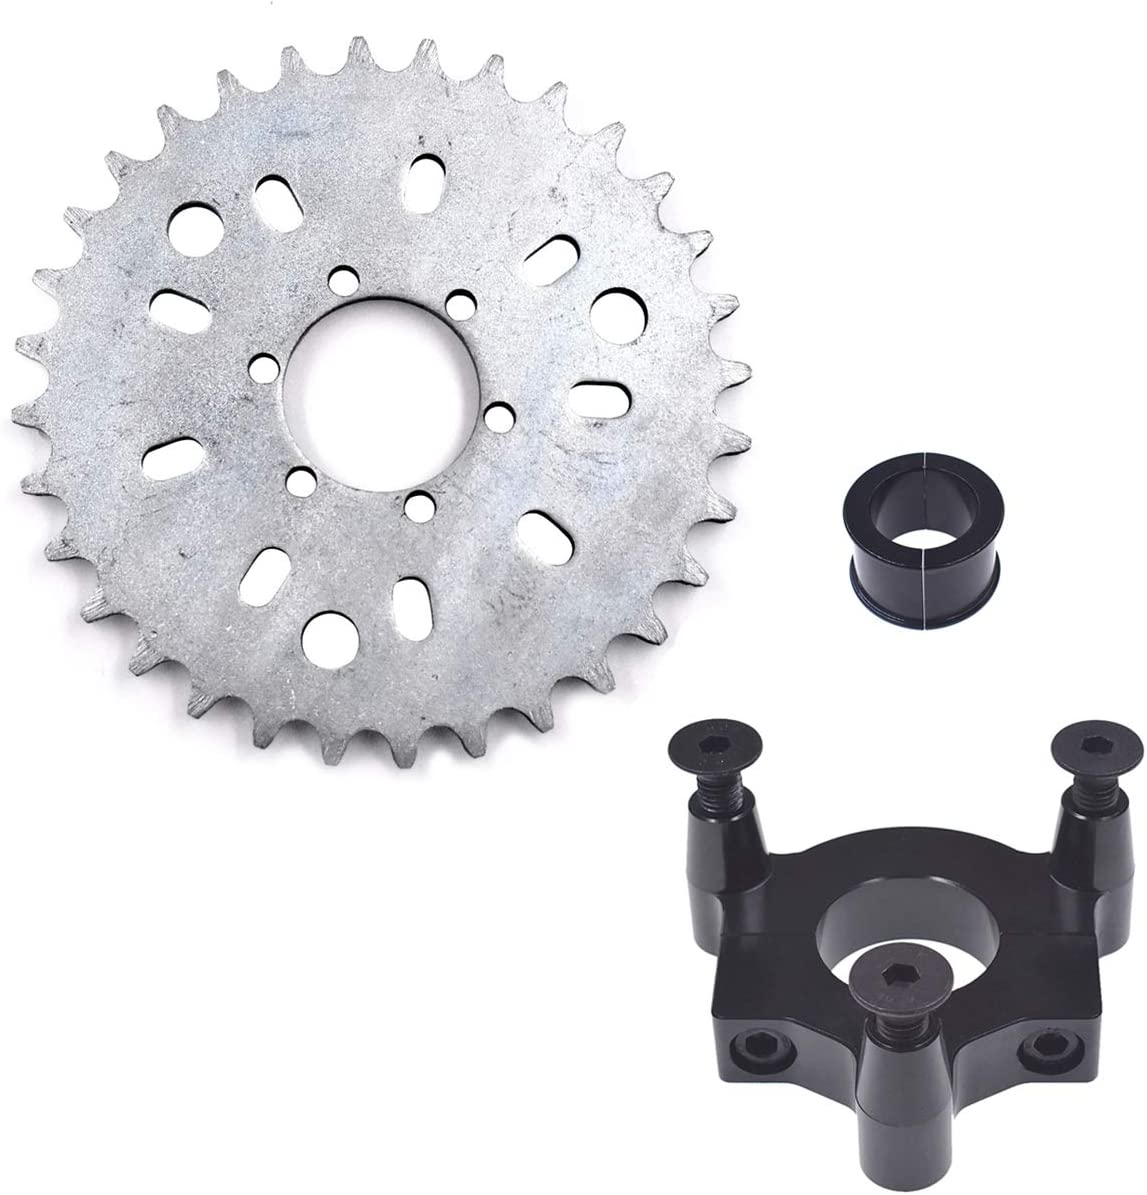 32T Sprocket Adapter Fits 415 Chain 49 50 66cc 80cc 2 Stroke Motorized Bike New